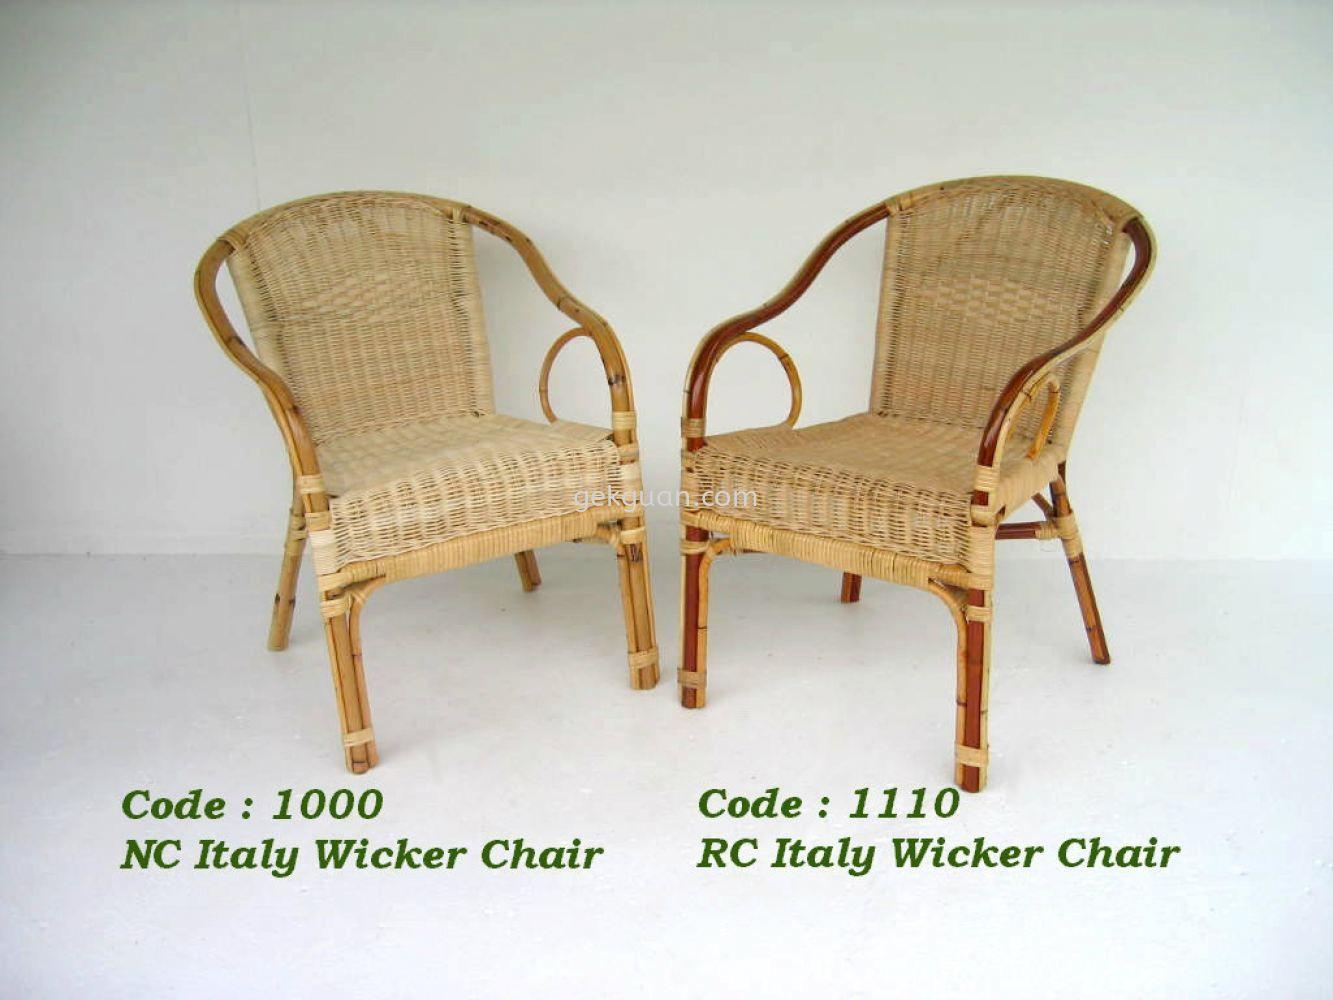 Sedie Bambu ~ Rf 013 曼丹骨子椅 rf 014 红藤骨子椅 rattan bamboo chair